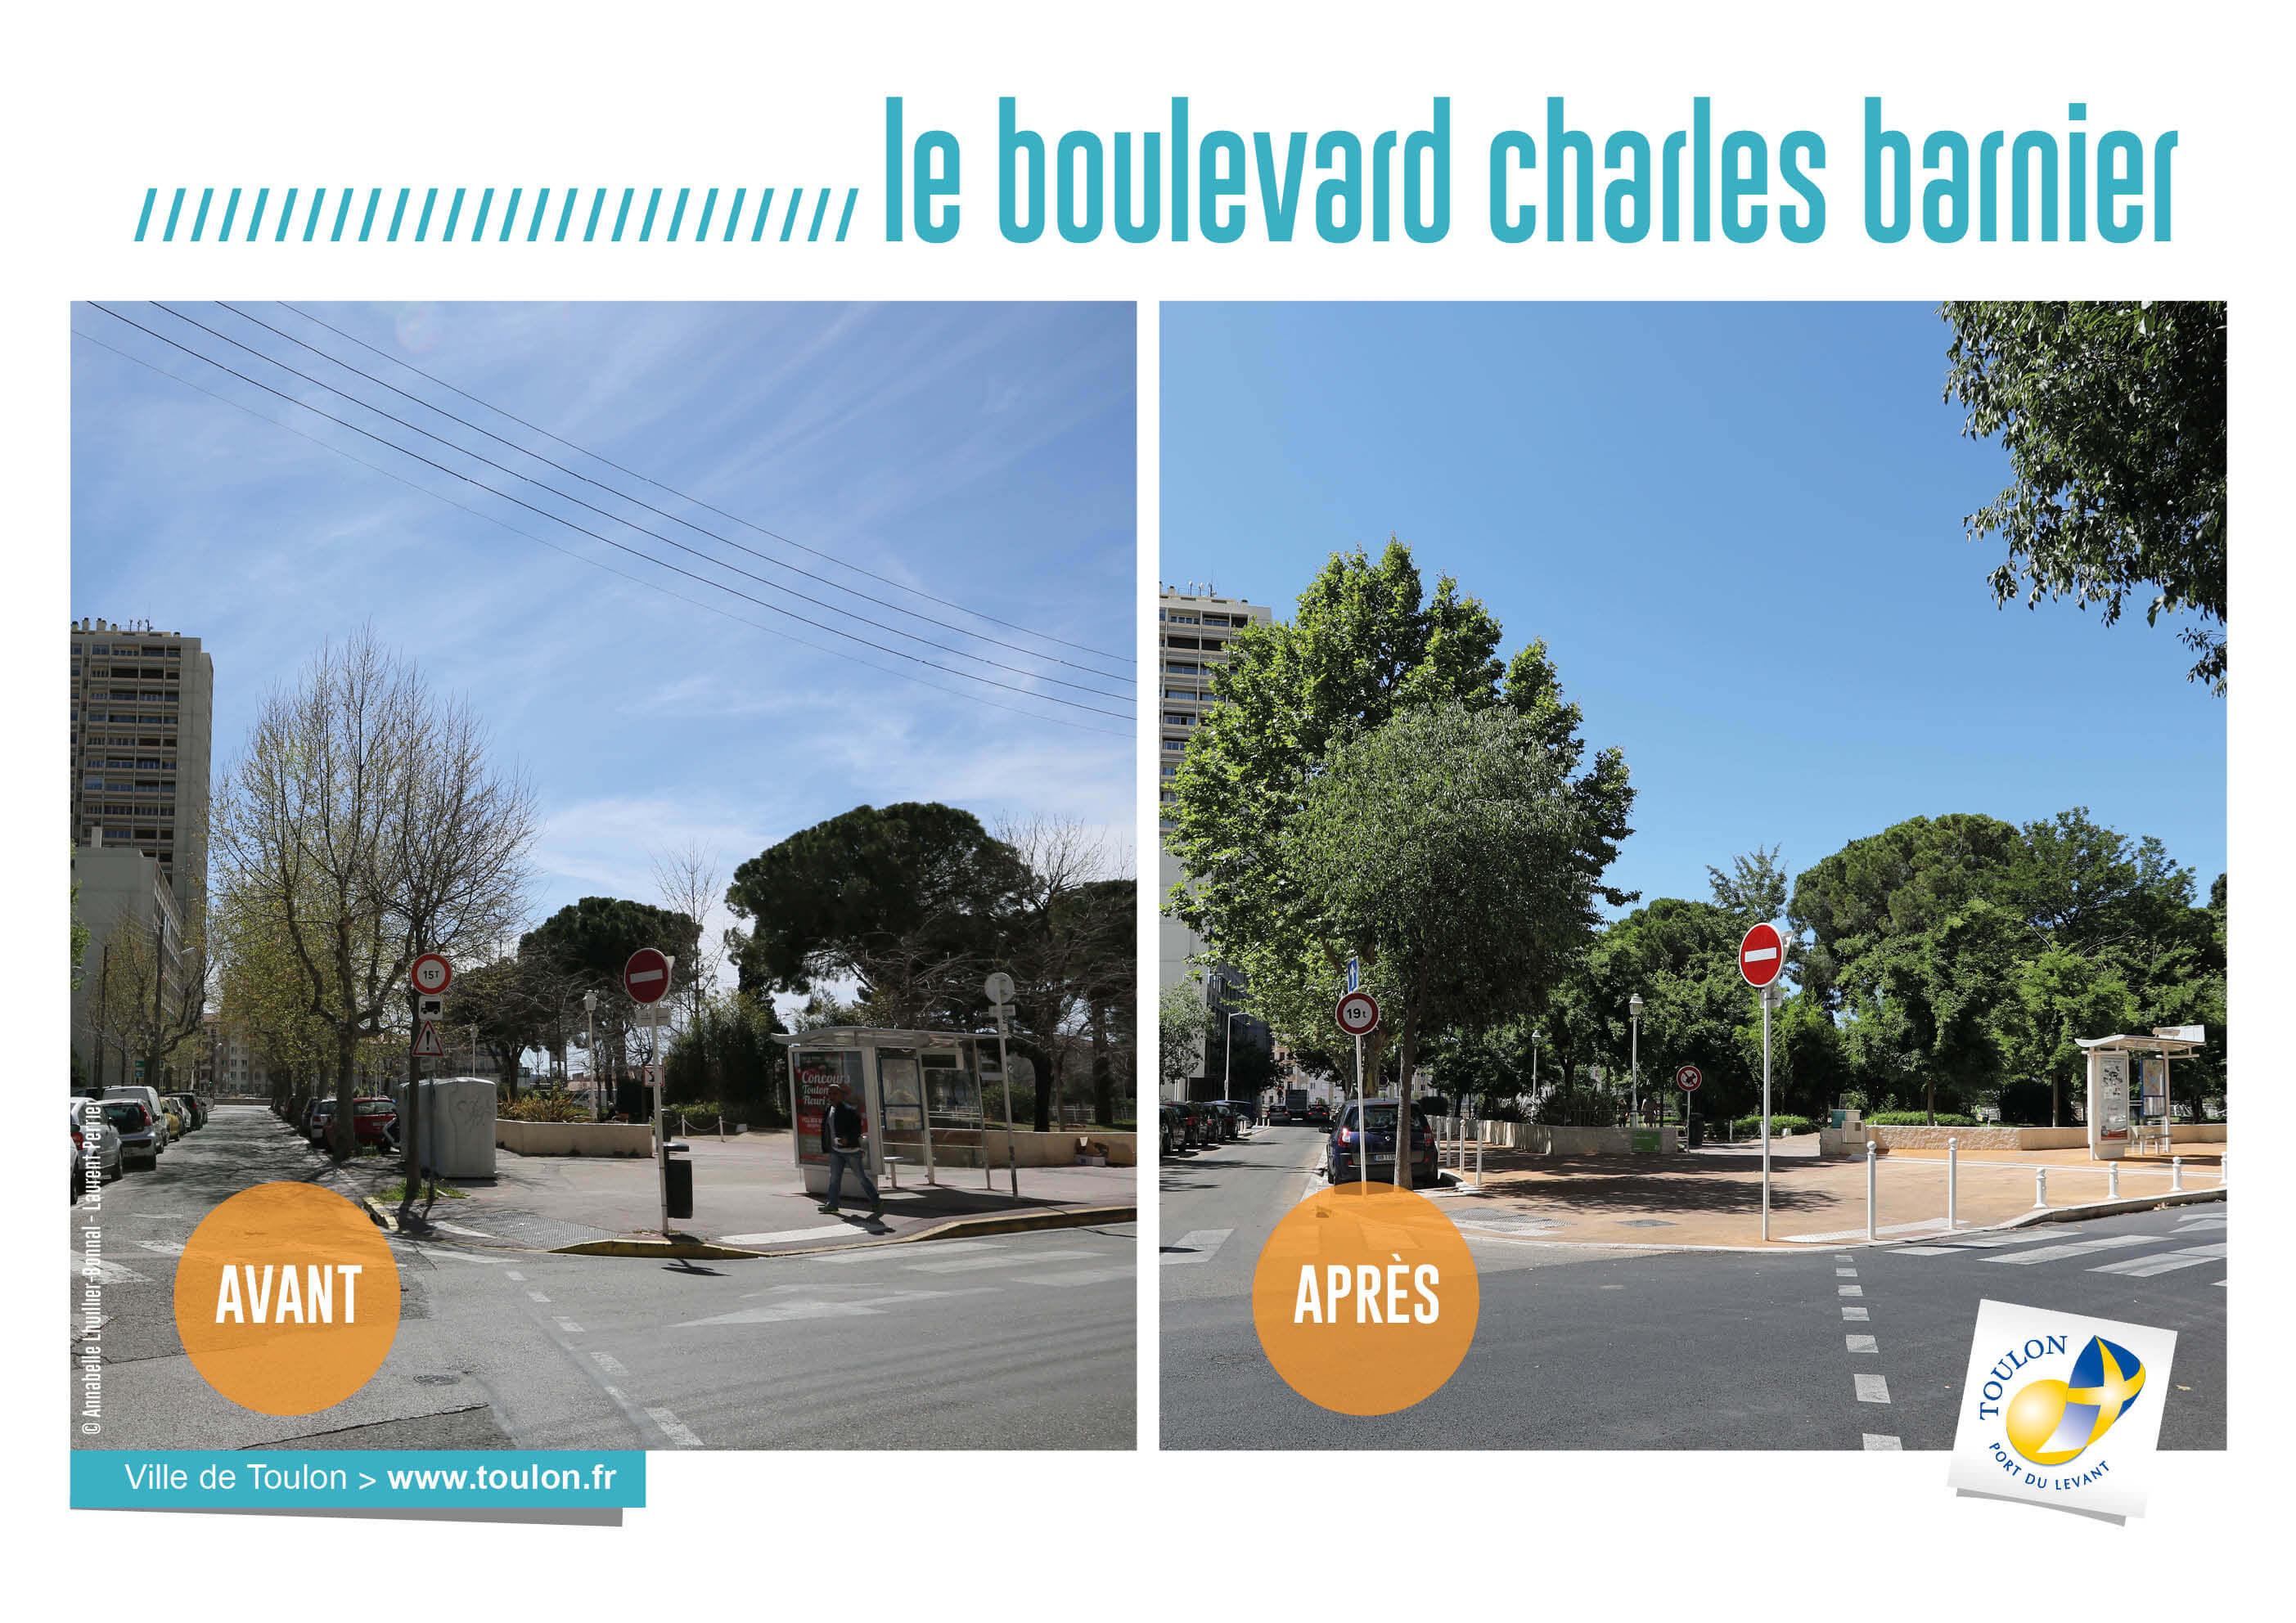 Le boulevard charles barnier